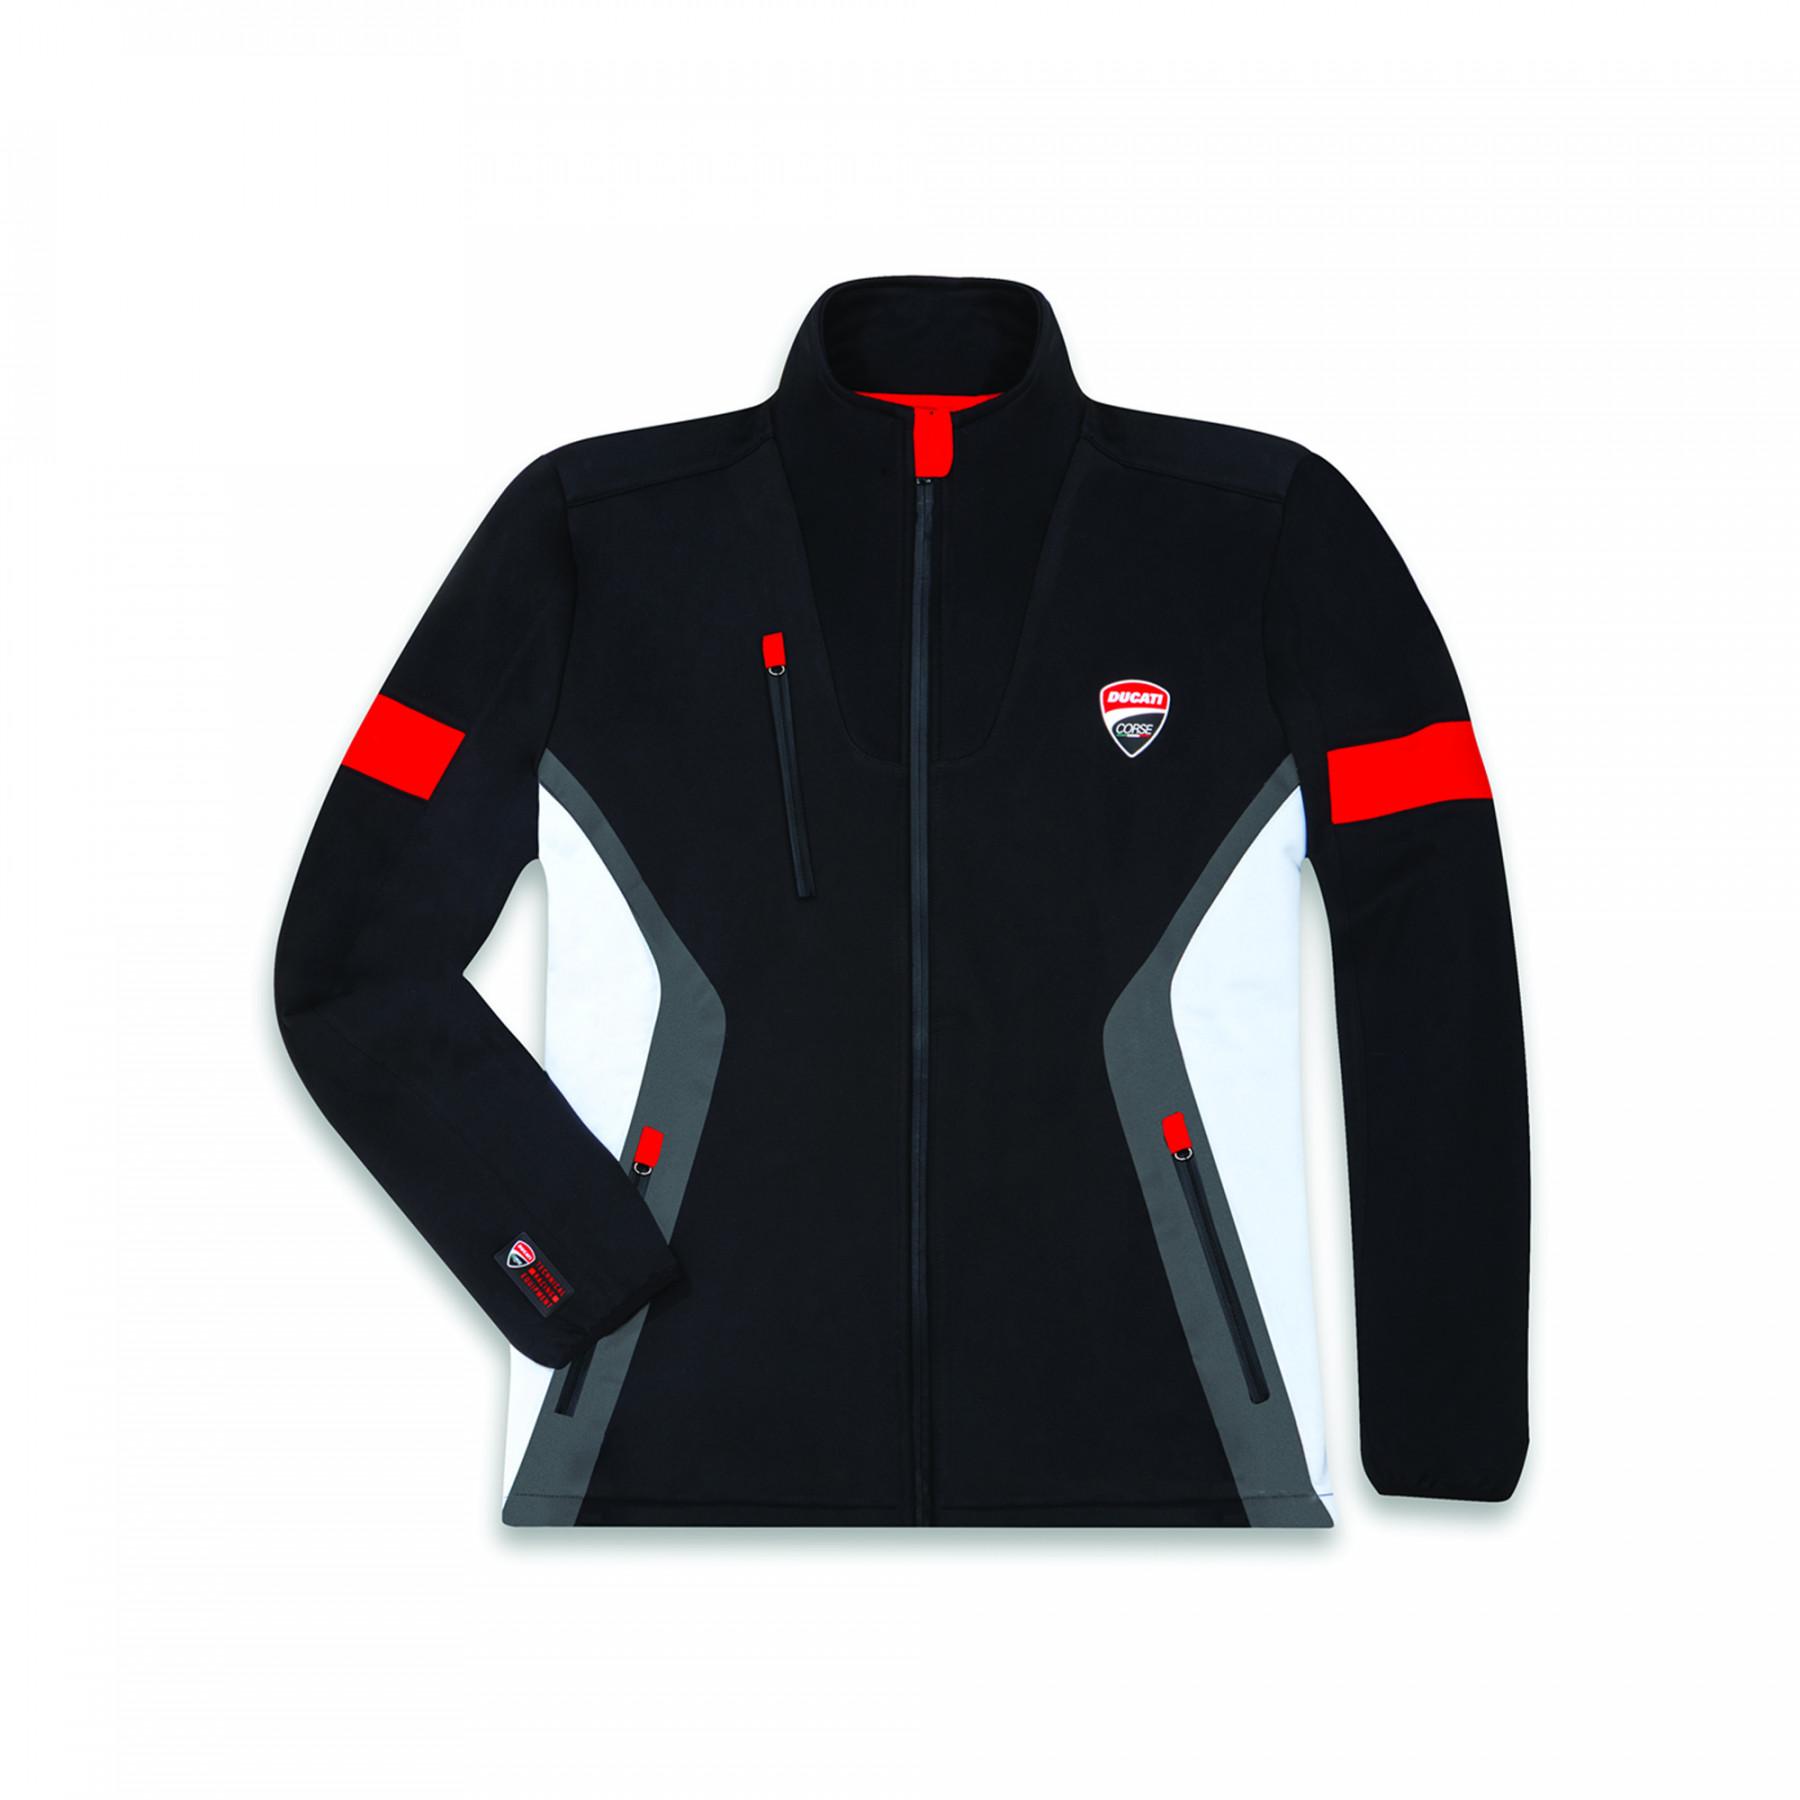 Ducati fleece jas Power Ducati Corse €98,50